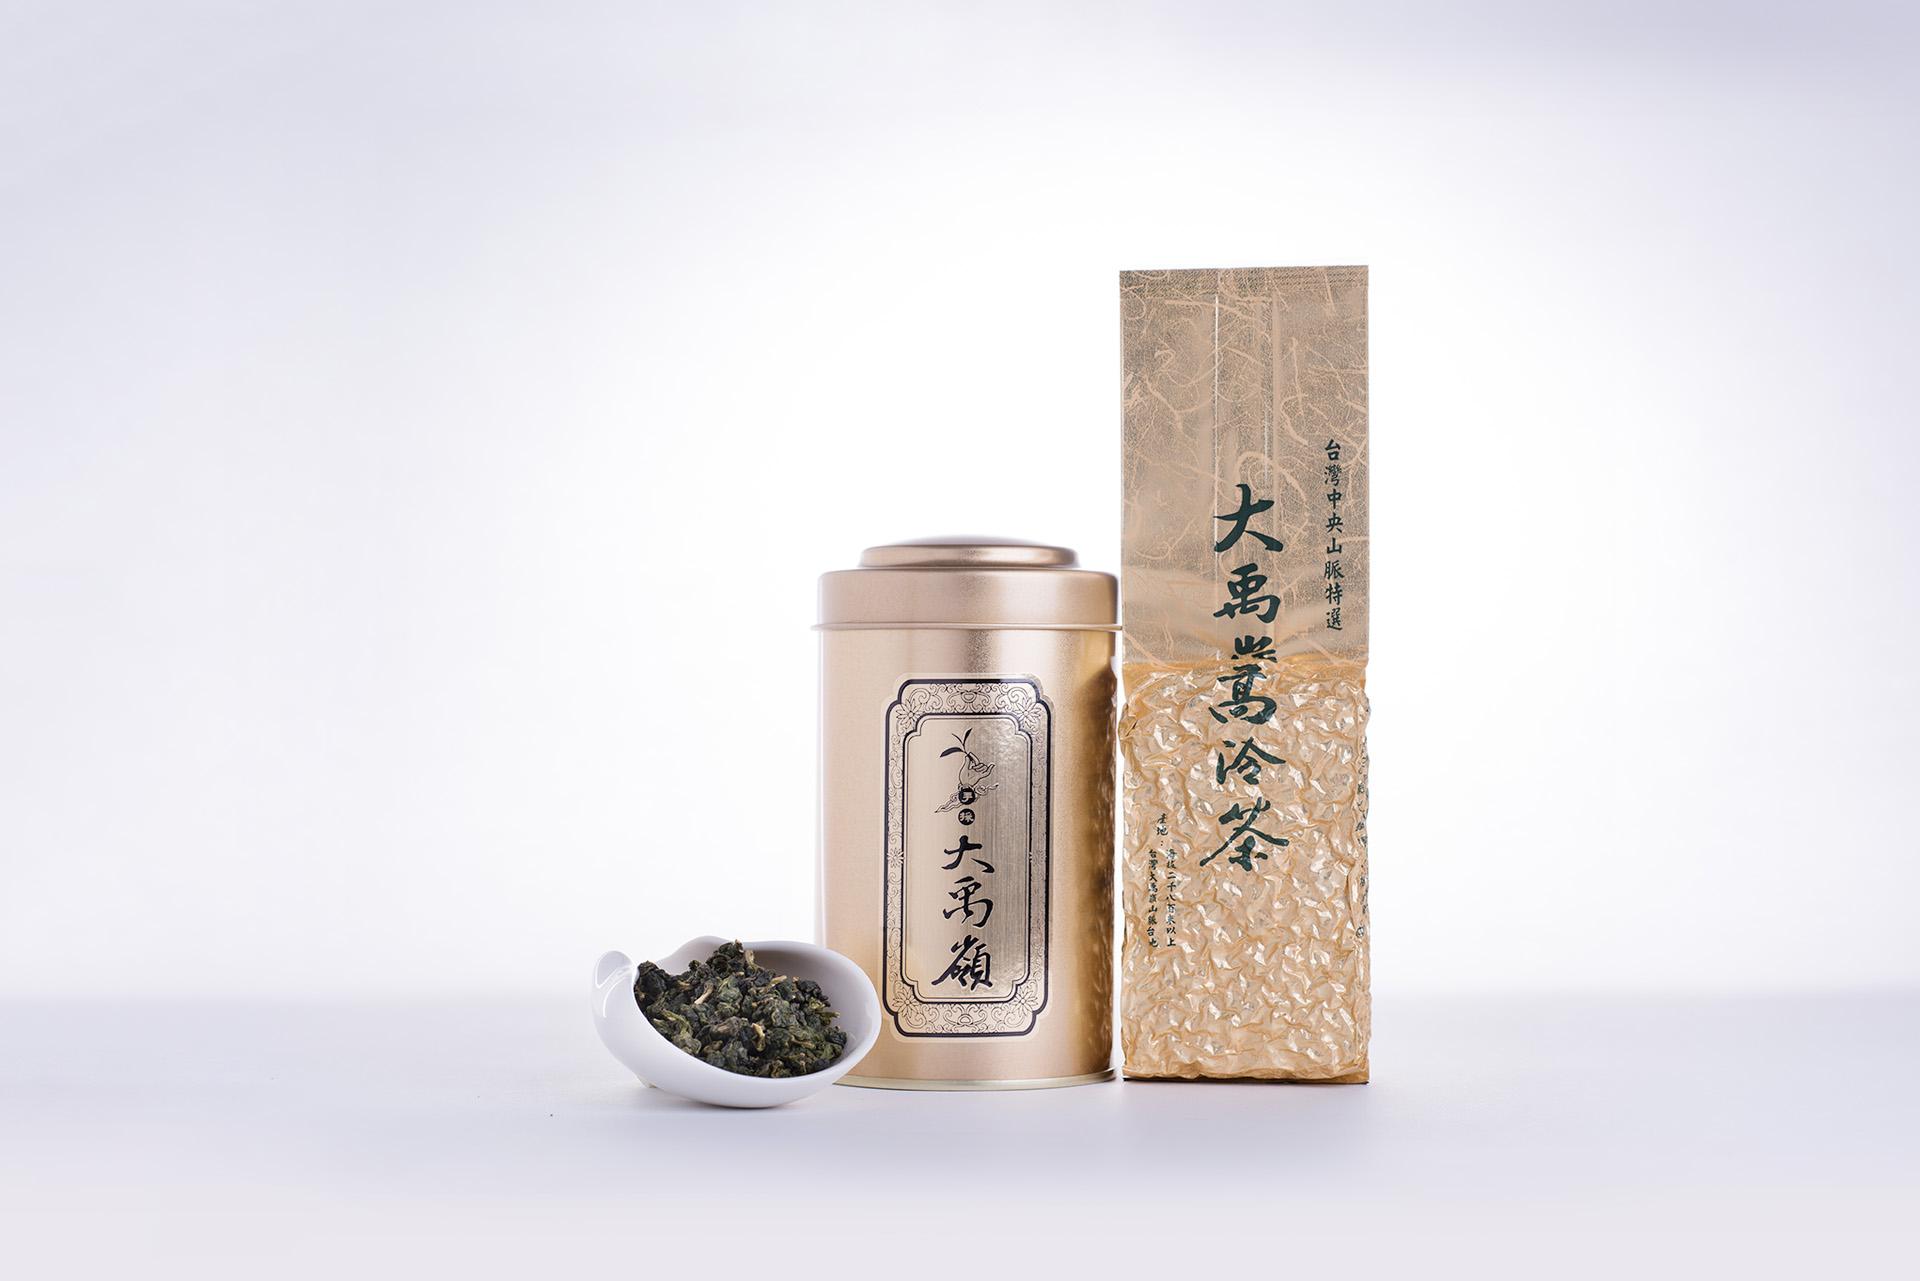 Dayu Charcoal Oolong Tea